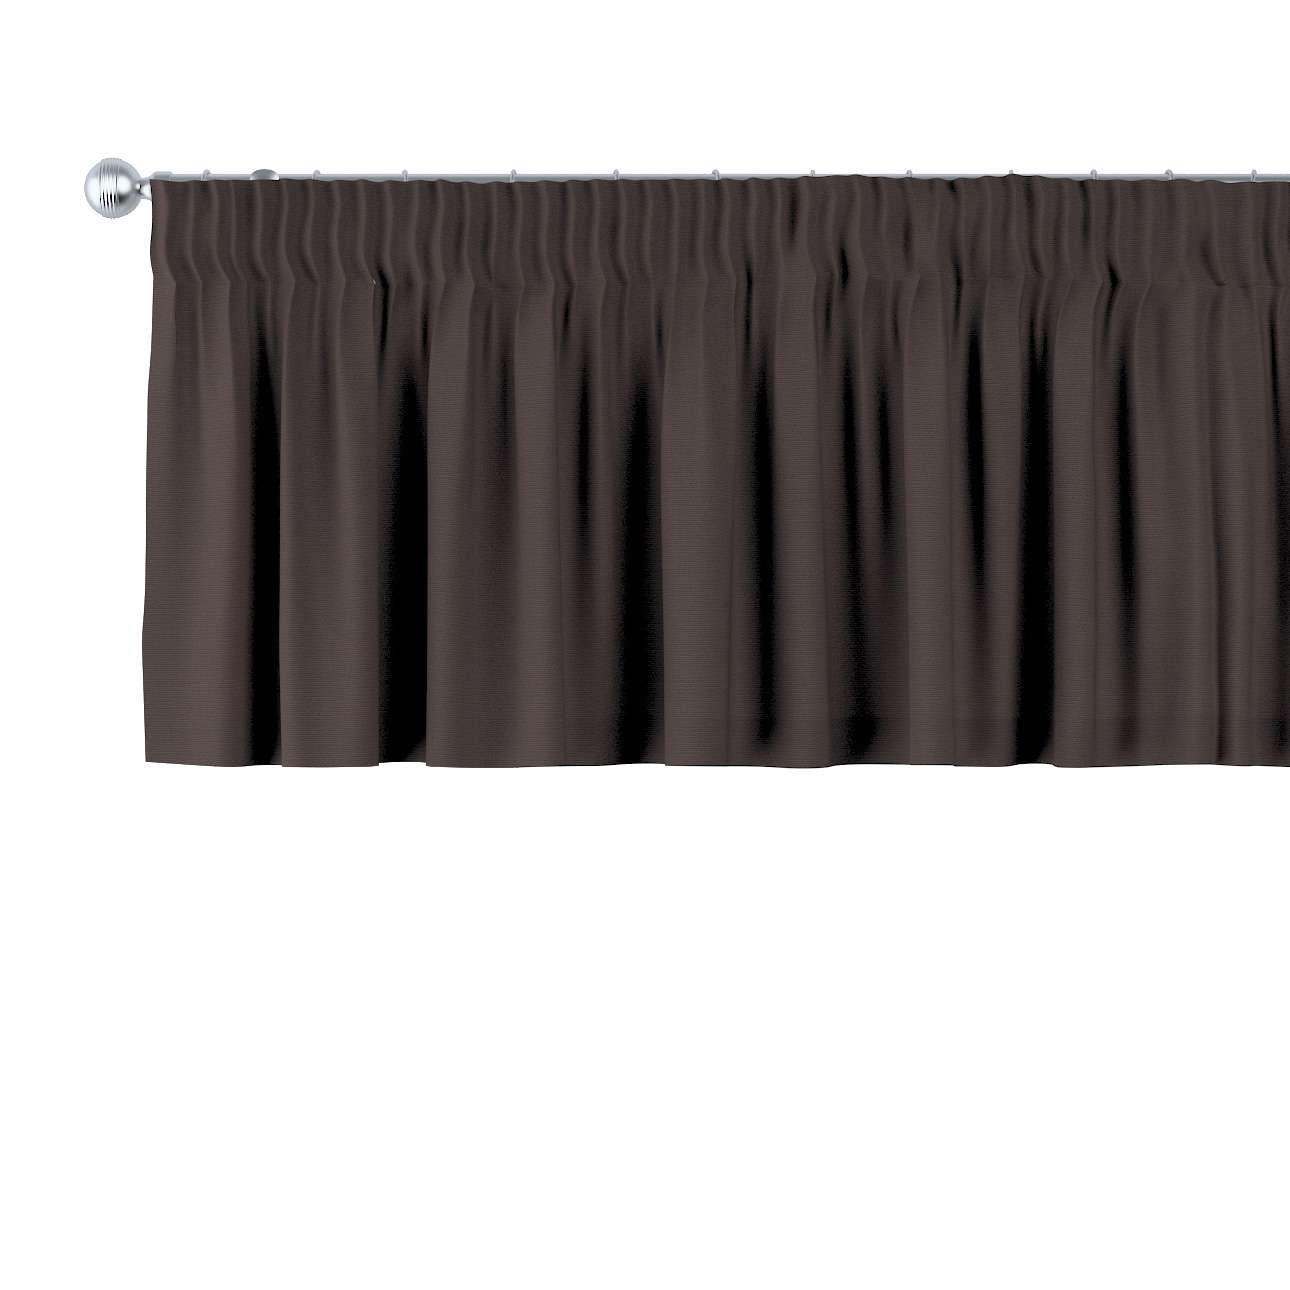 Kurzgardine mit Kräuselband 130 x 40 cm von der Kollektion Cotton Panama, Stoff: 702-03